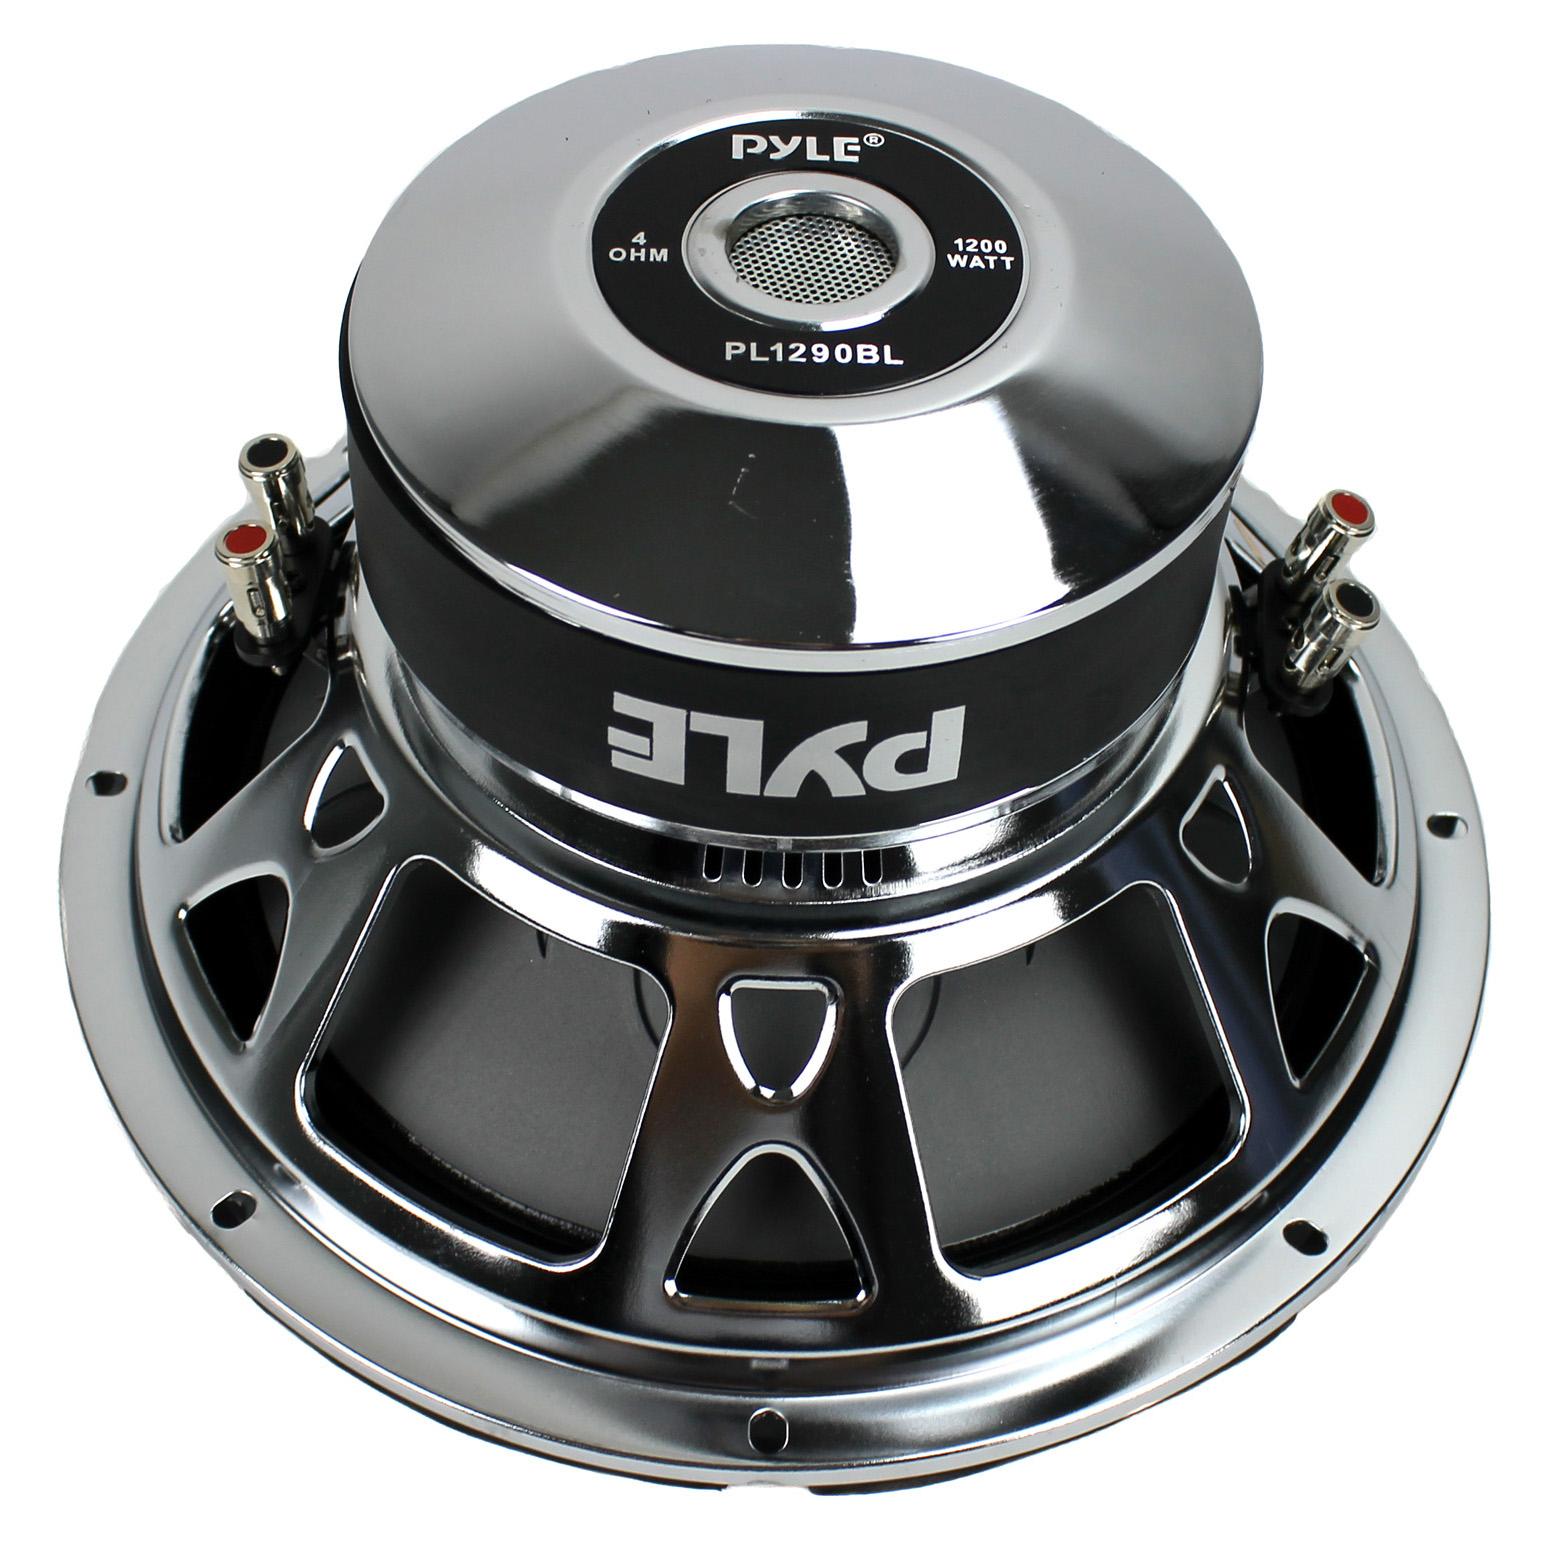 Pyle 12 Inch 1200 Watt DVC Blue Power Stereo Car Audio